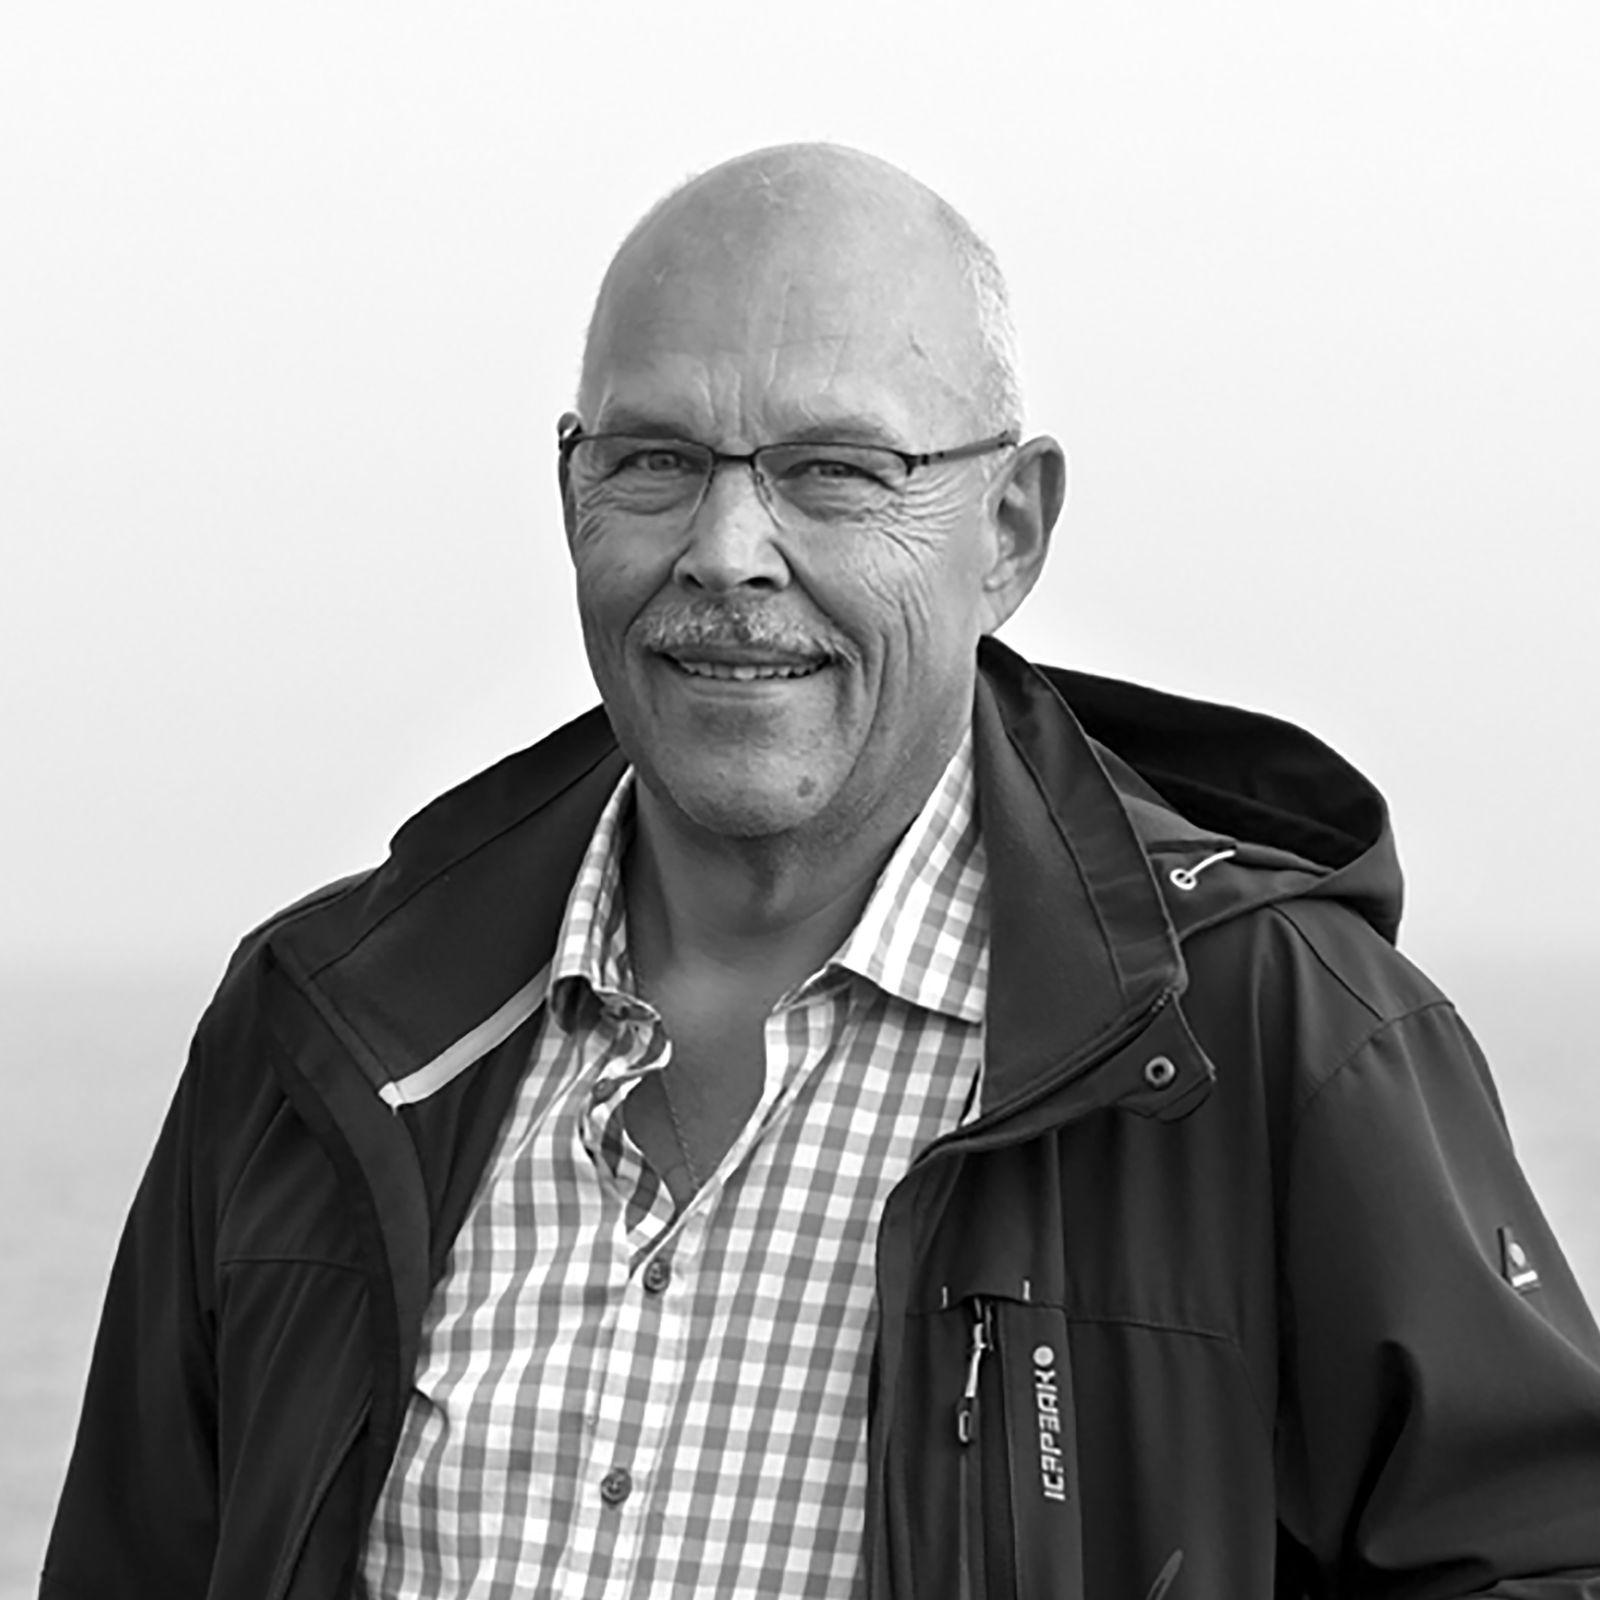 Glen Sidor